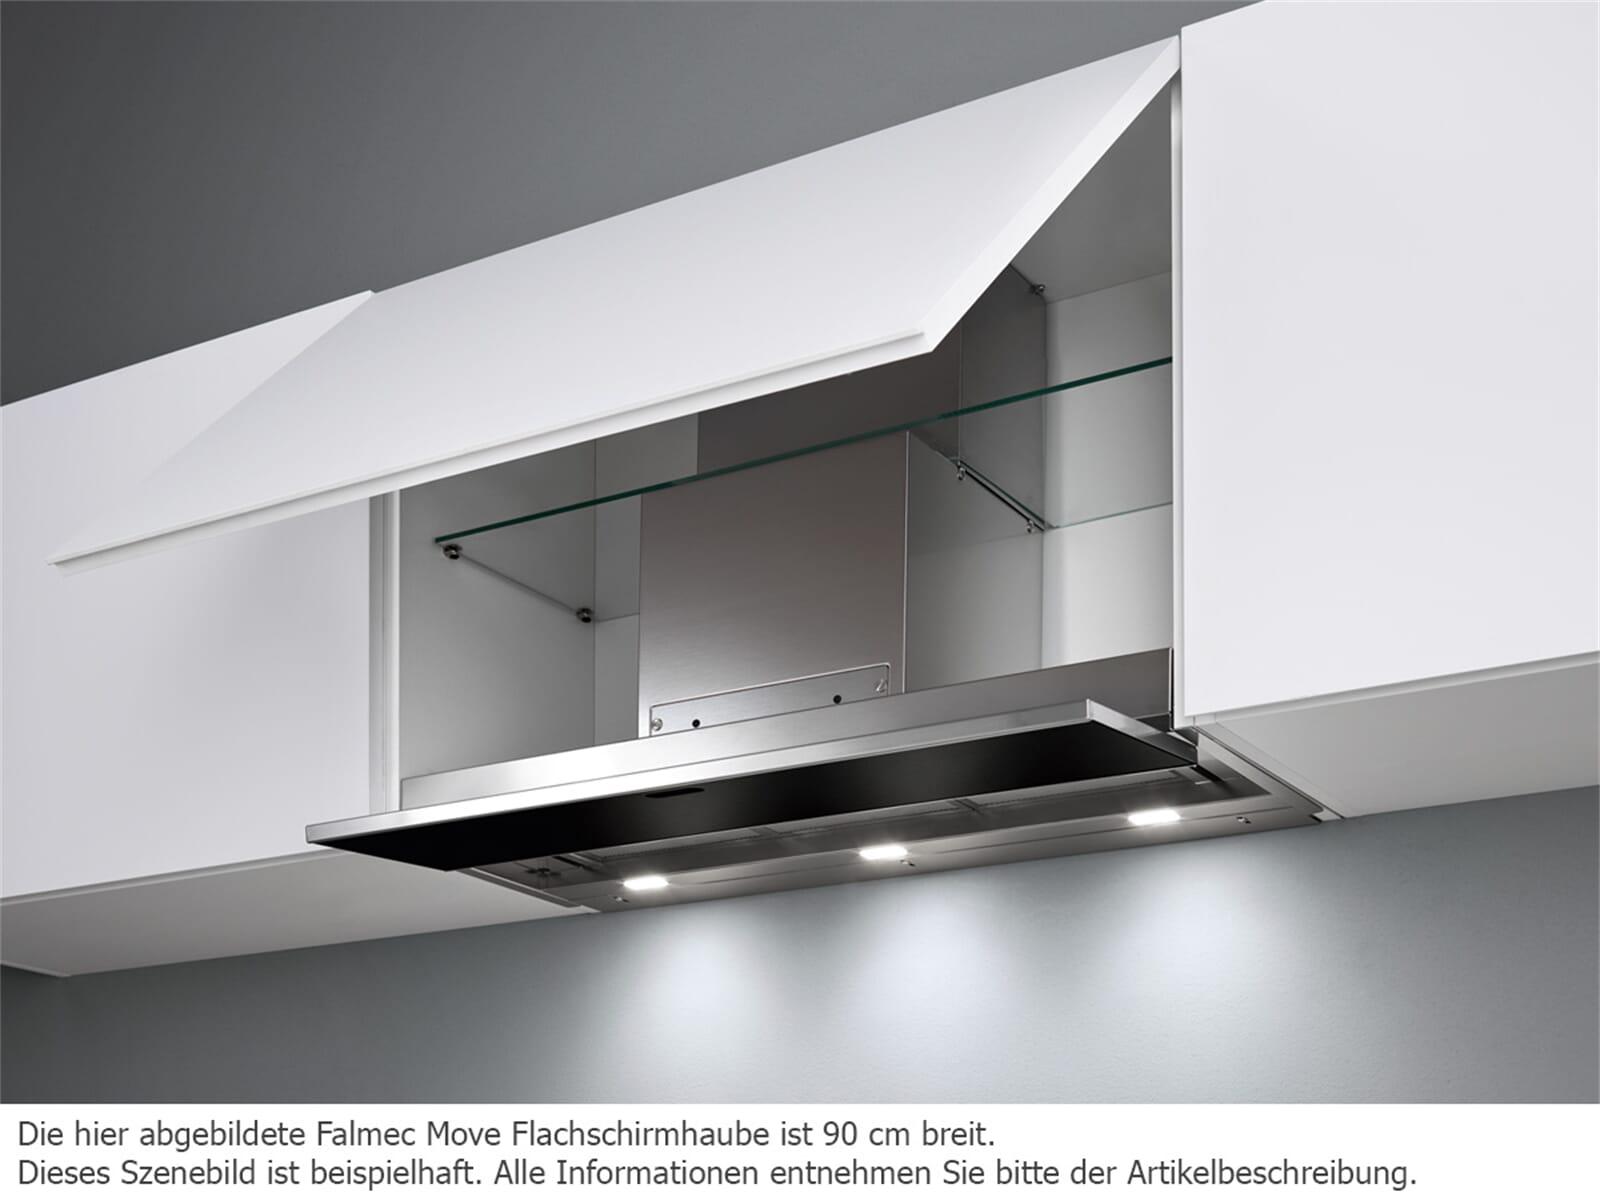 falmec move 60 schwarz flachschirmhaube edelstahl. Black Bedroom Furniture Sets. Home Design Ideas